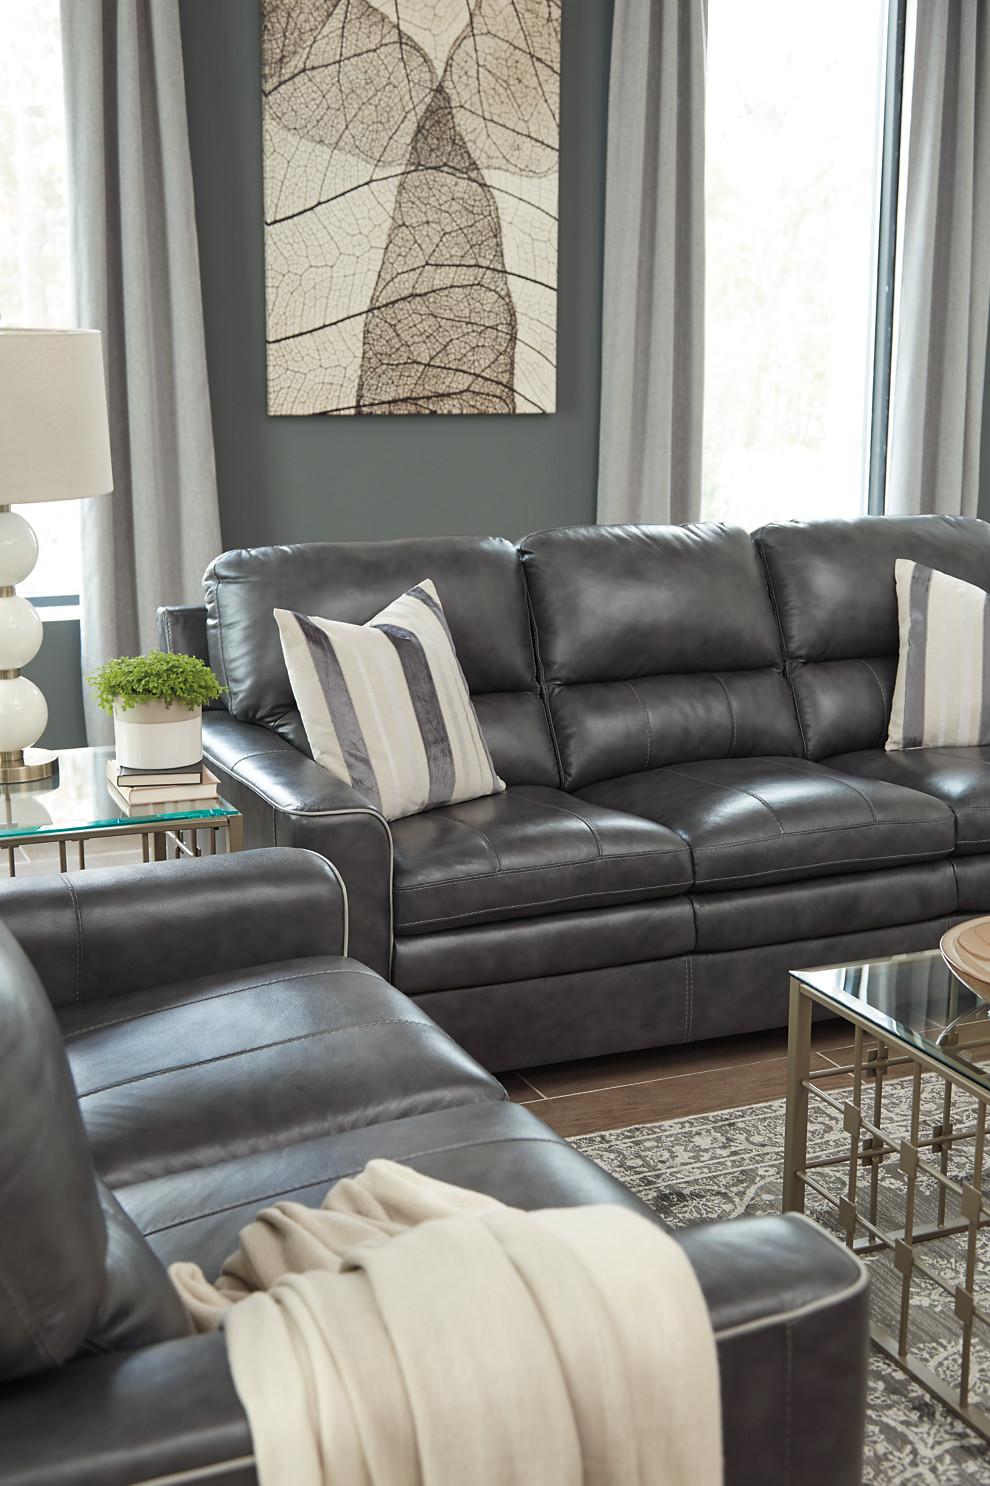 Gleason Sofa Corporate Website Of Ashley Furniture Industries Inc  ~ Charcoal Gray Leather Sofa